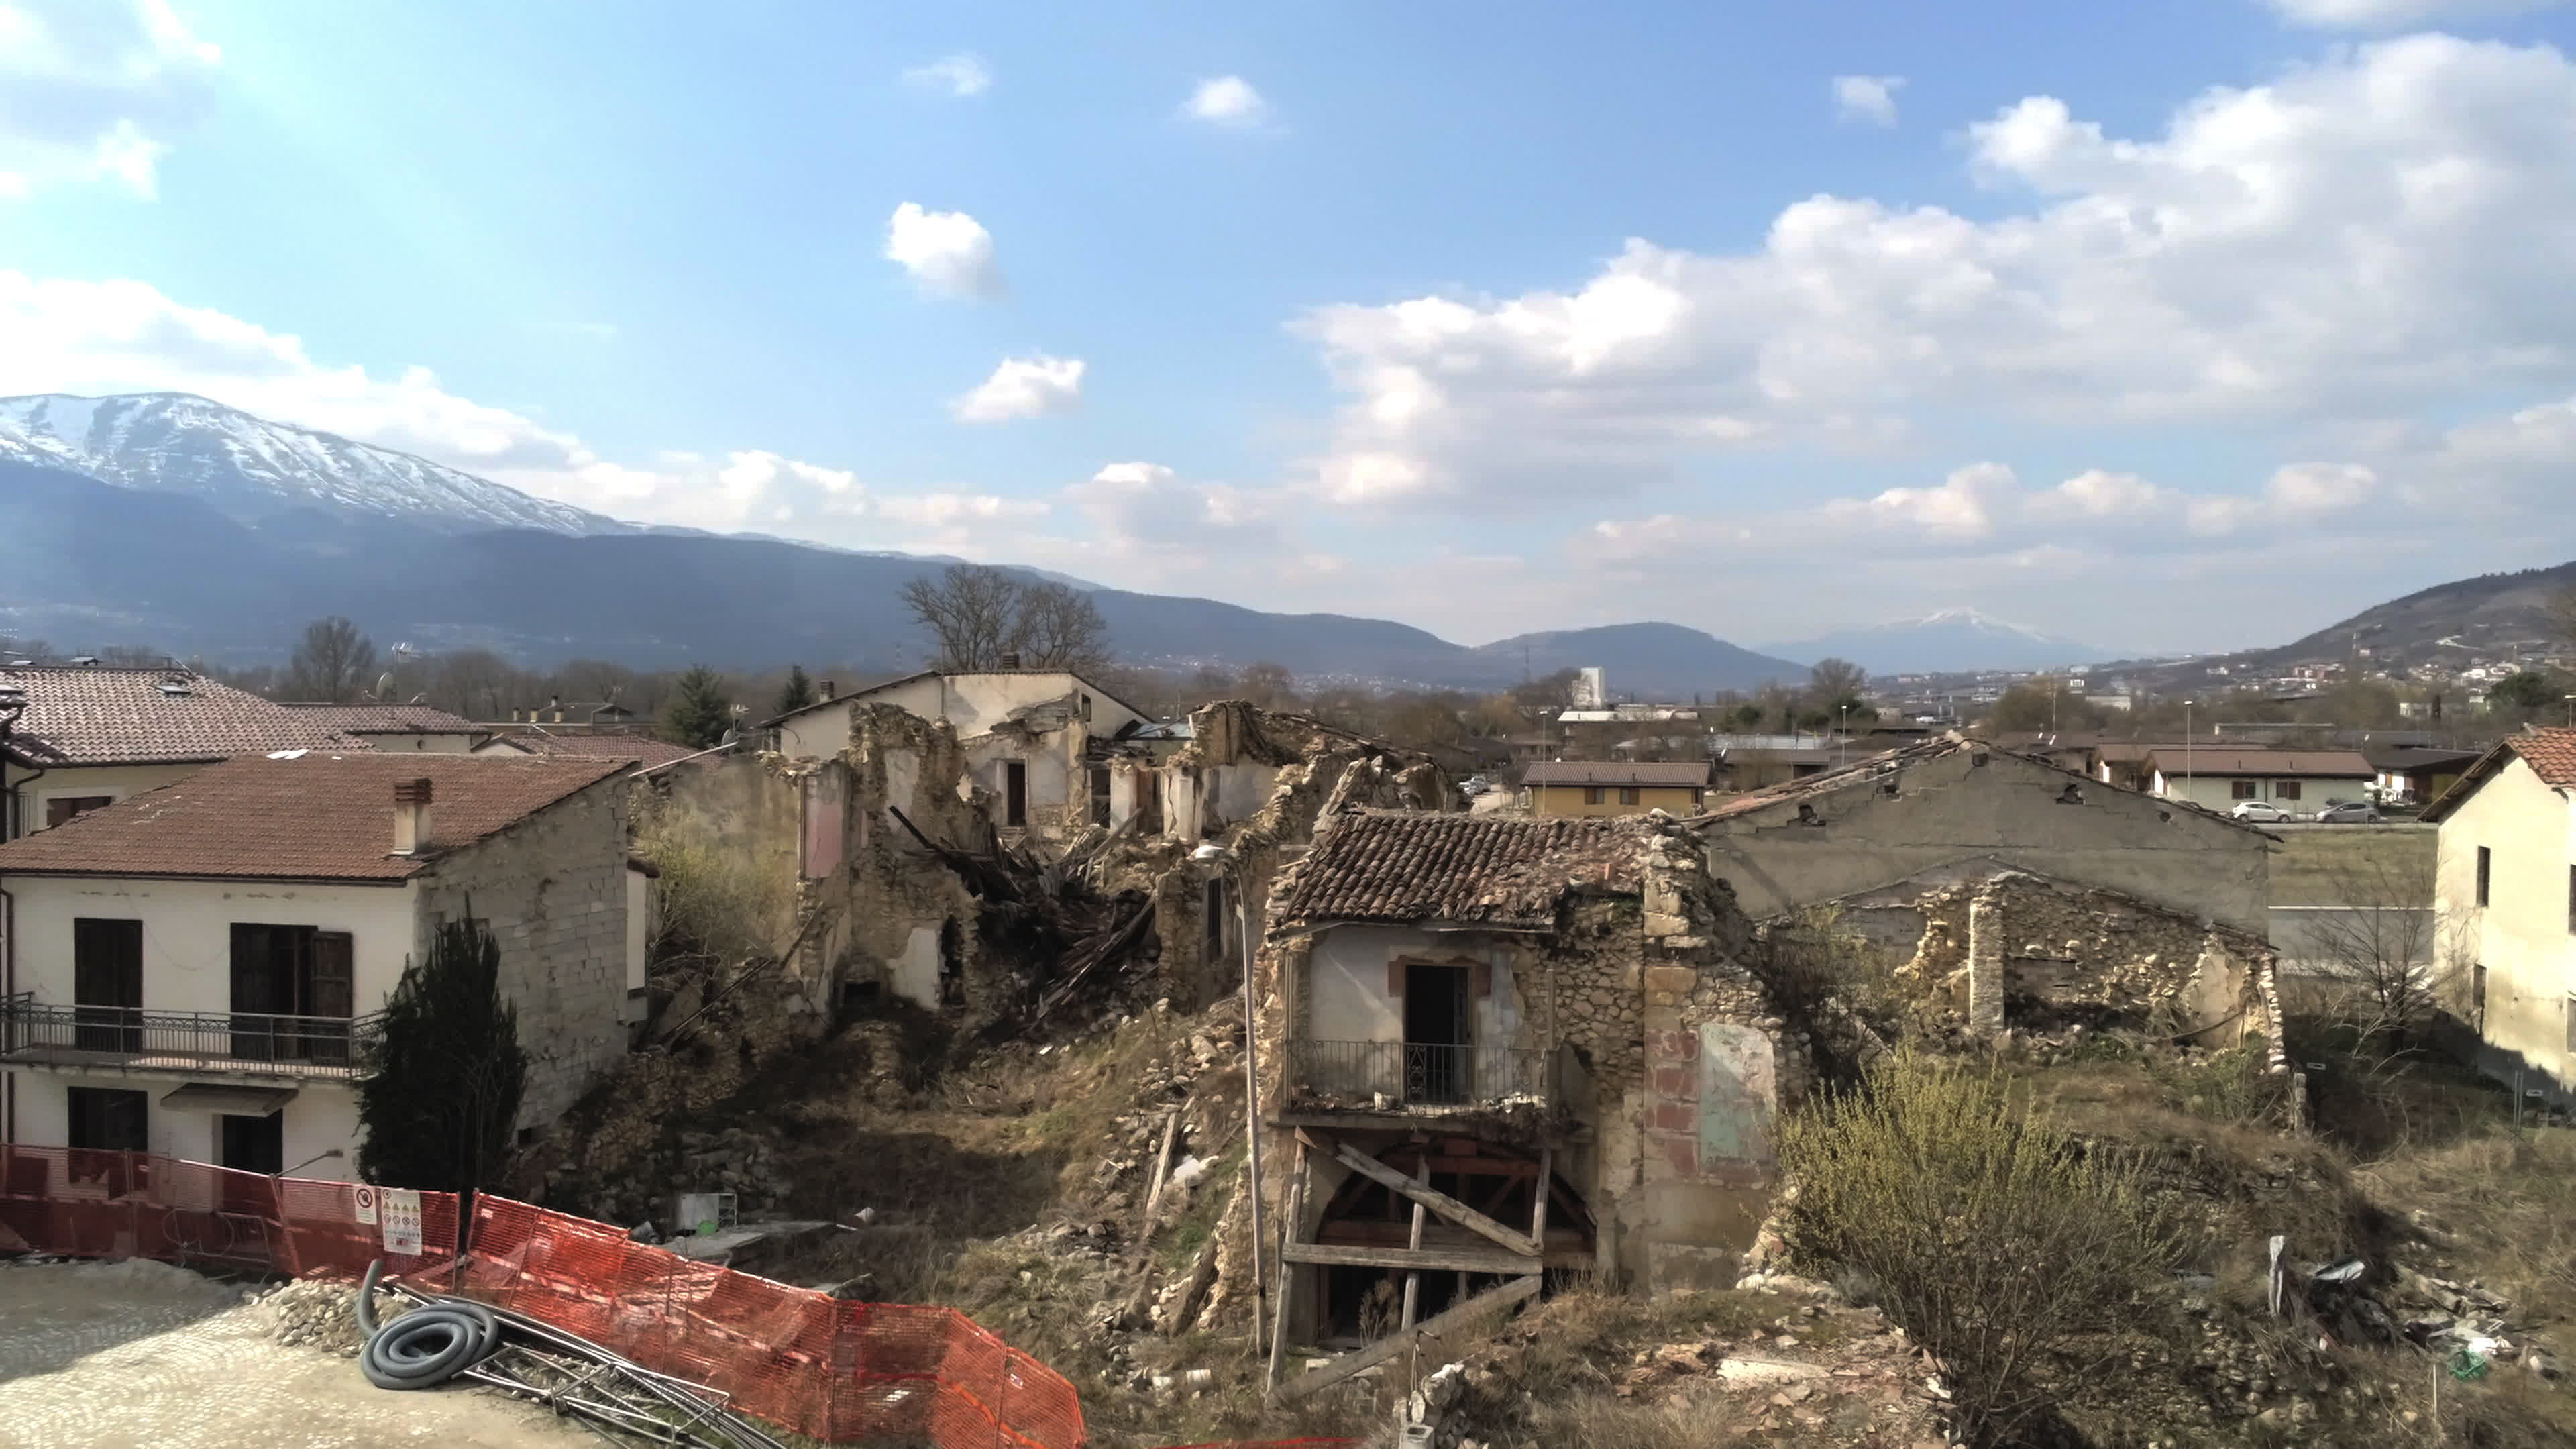 L'Aquila Marks 10-year Anniversary of 2009 L'Aquila Earthquake